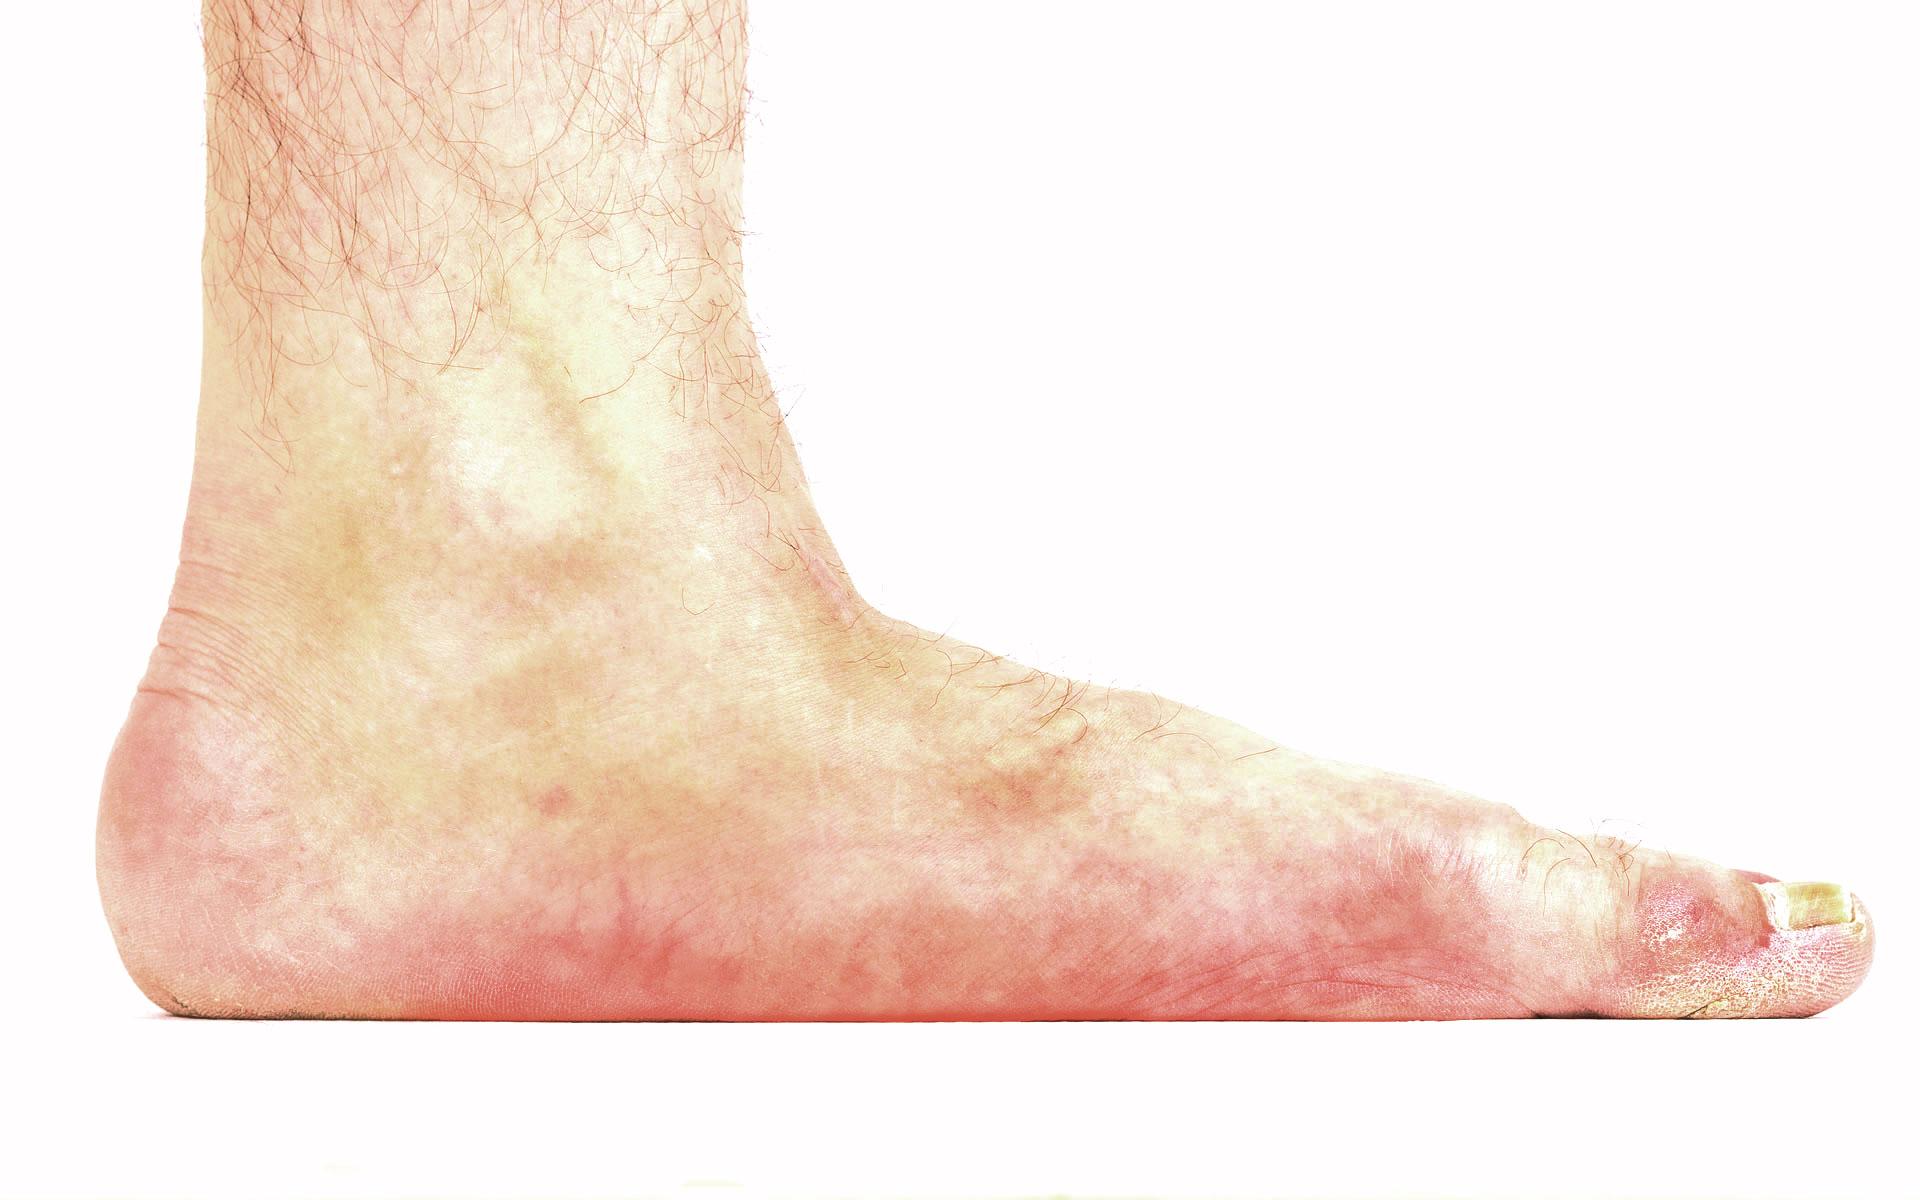 Flat Feet Treatment Dr. Paul Brody